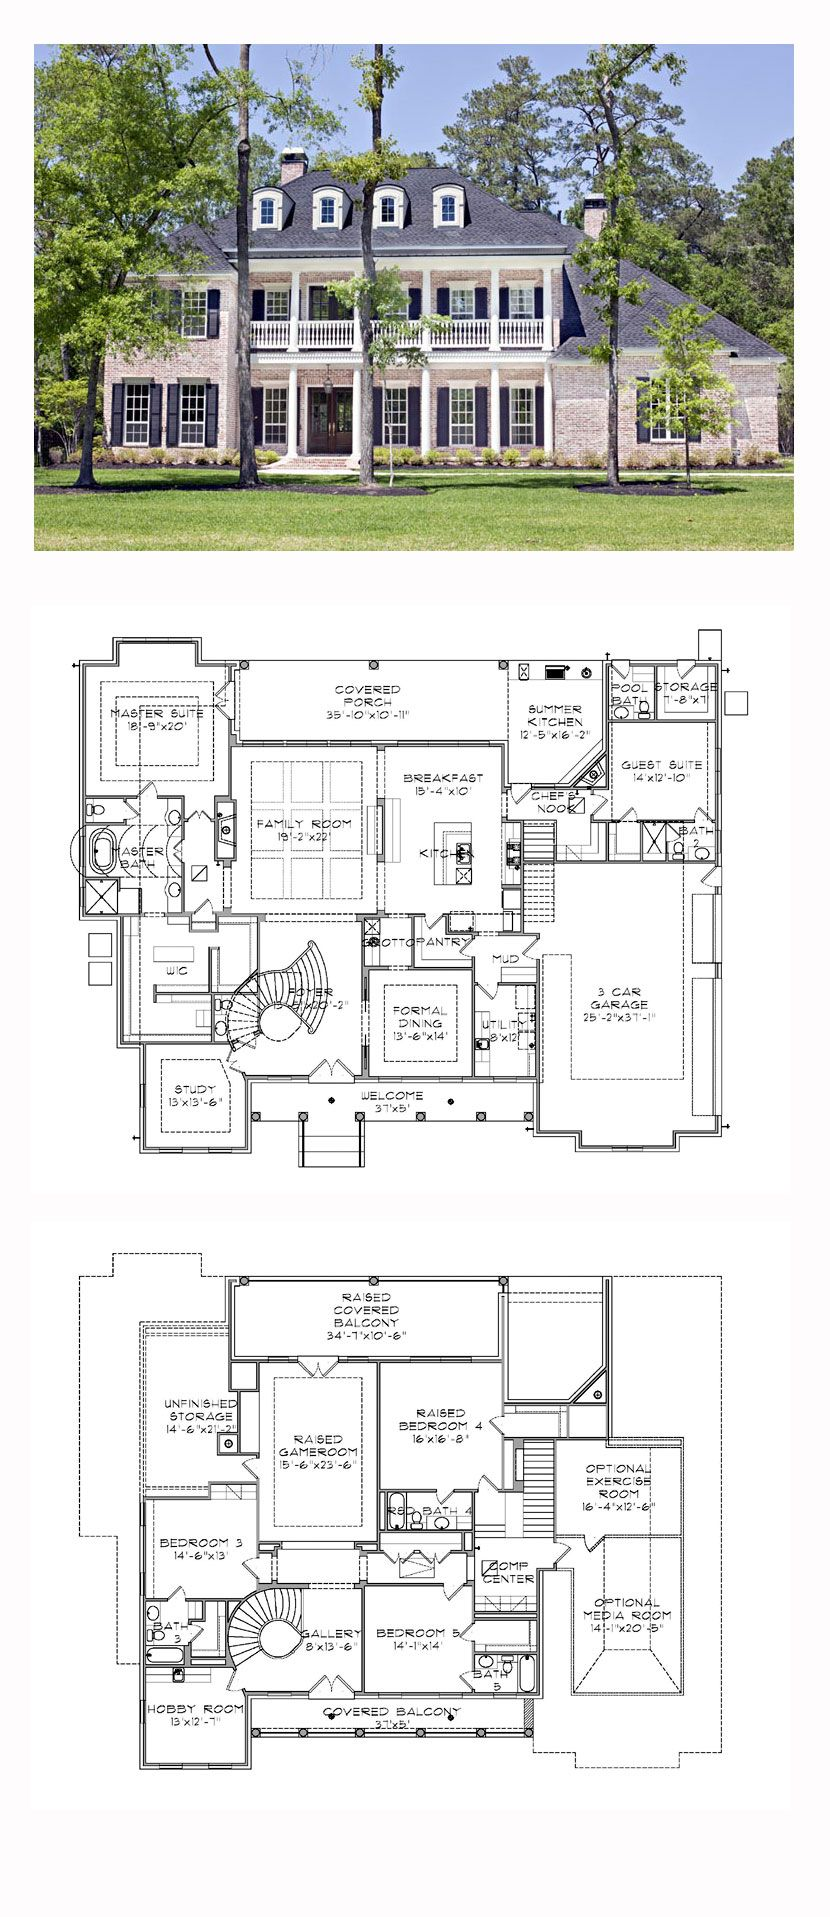 Plantation House Plan 77818 Total Living Area 5120 Sq Ft 5